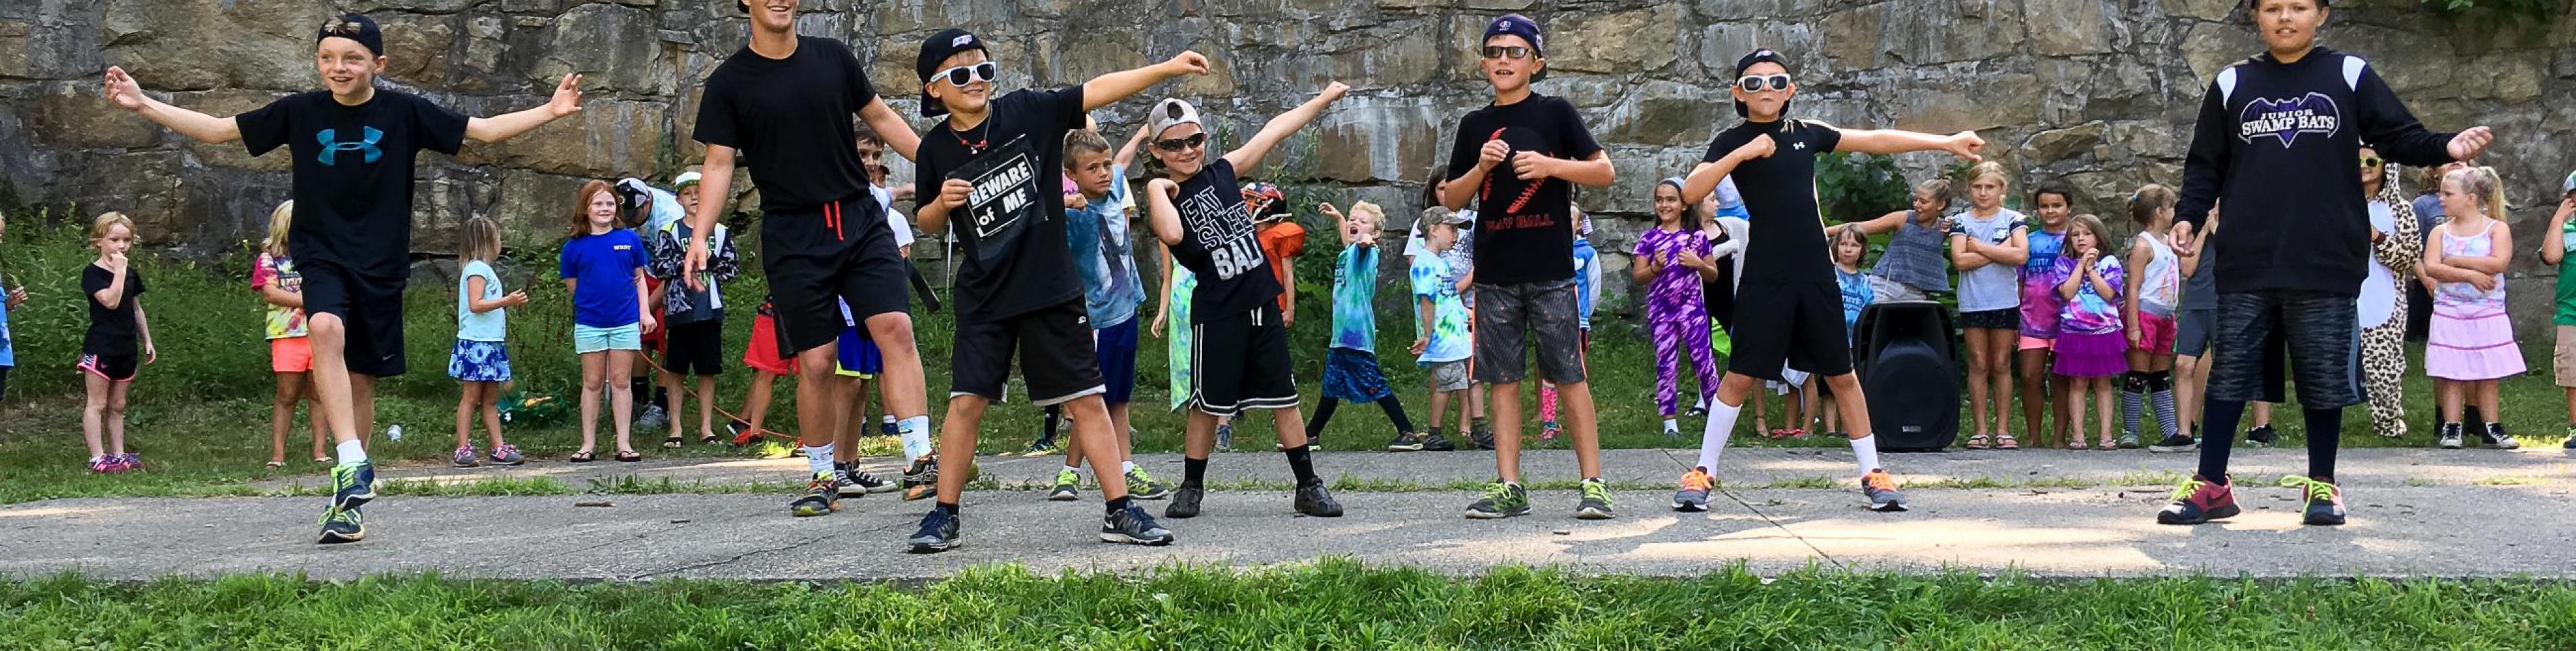 kids at Robin Hood Park